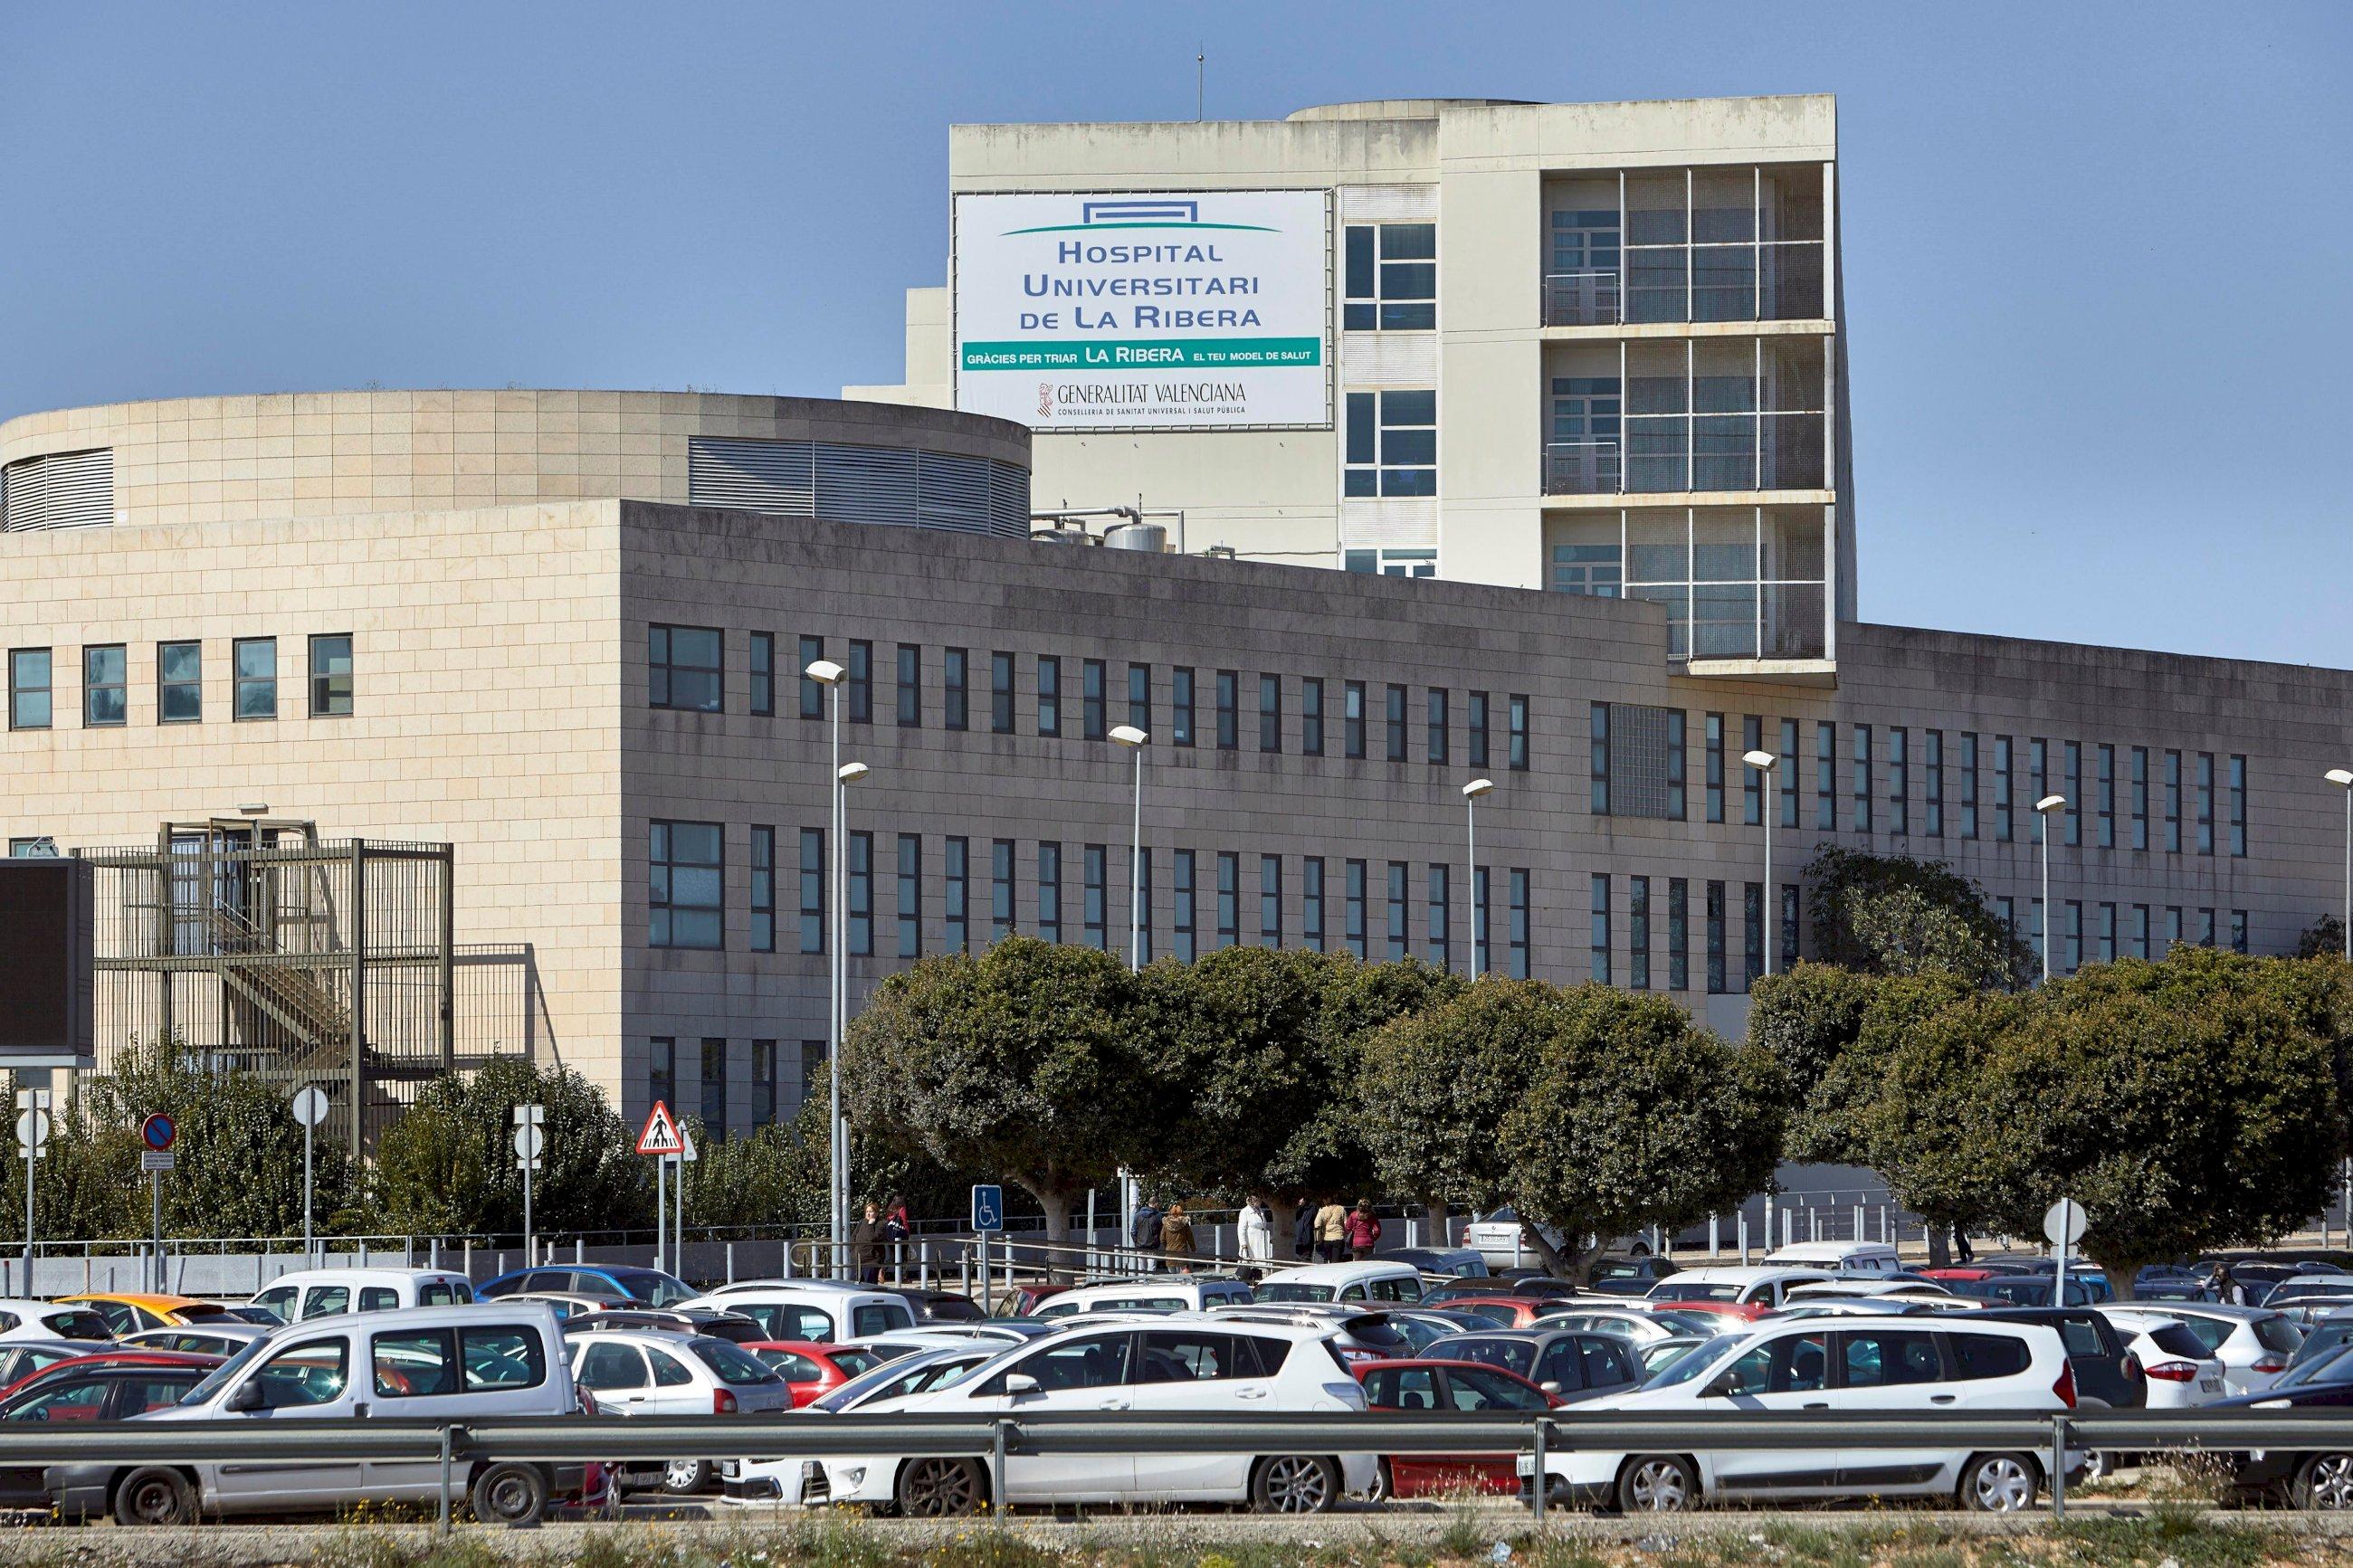 hospital de la ribera repor